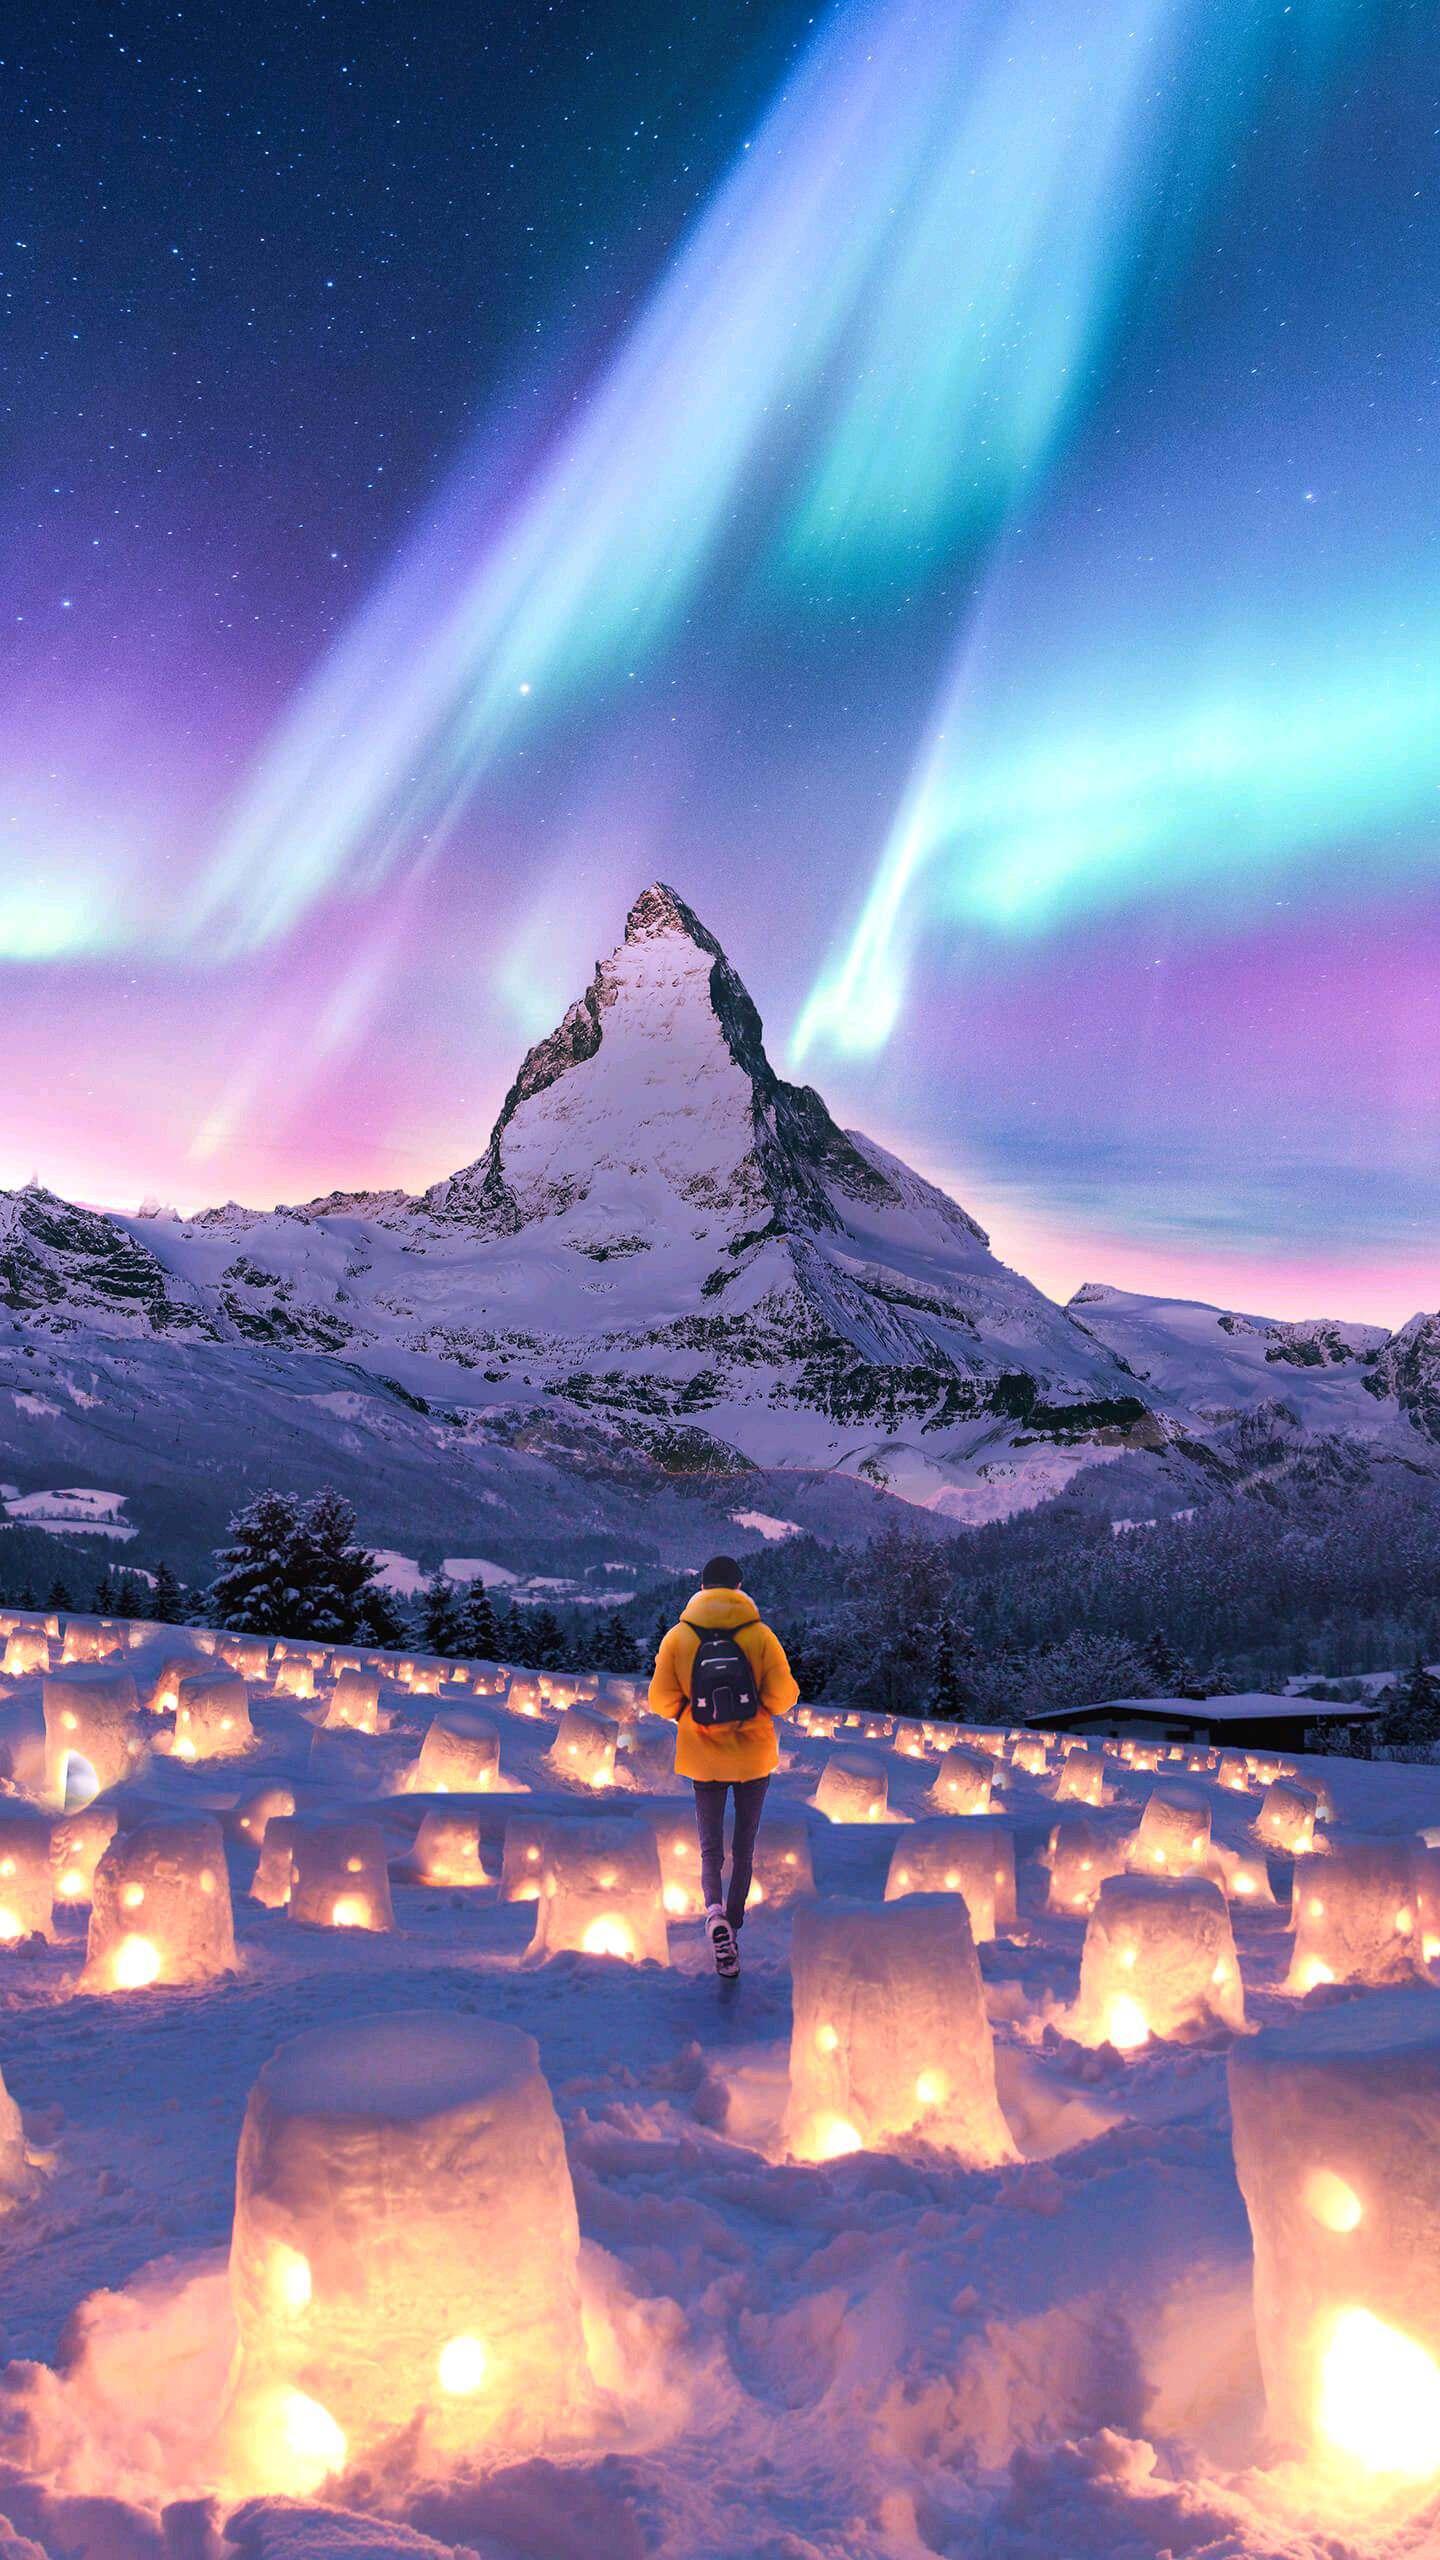 Alps Mountain Switzerland Valley of snow lanterns iPhone Wallpaper